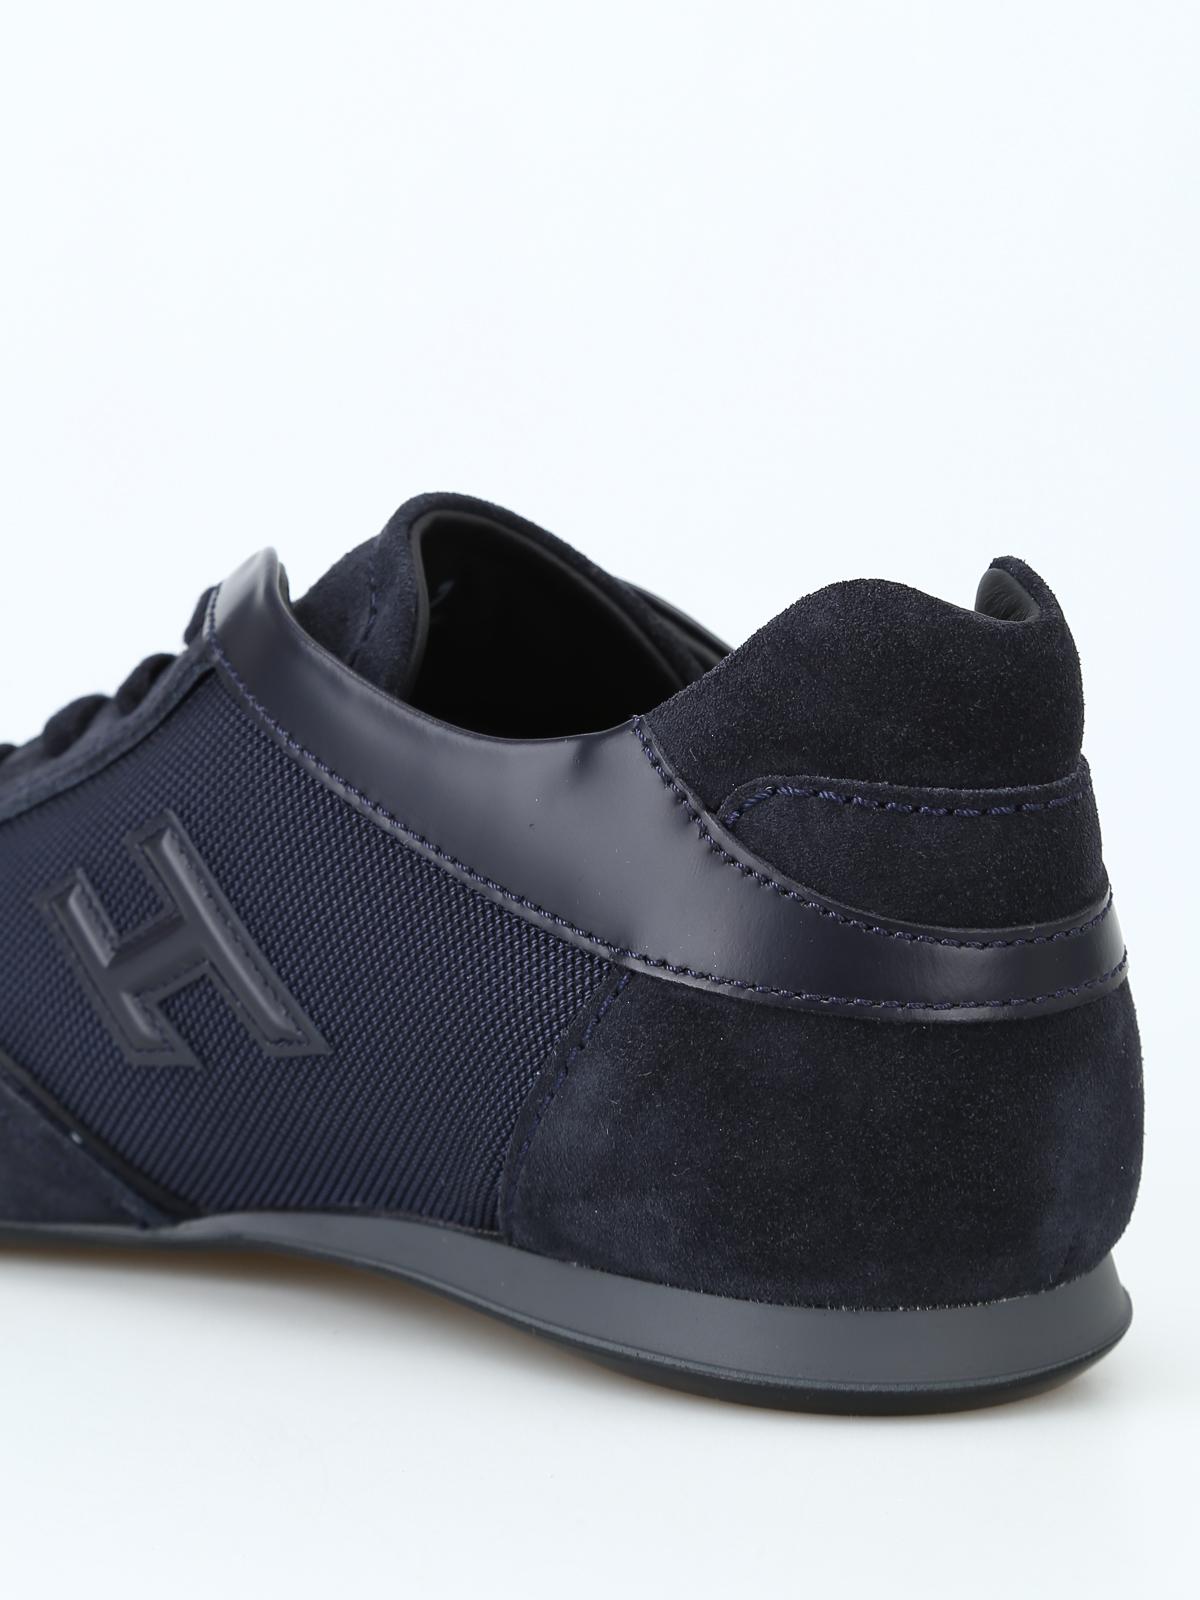 Sneakers Hogan - Sneaker basse Olympia blu - HXM0570I972JC89E7D